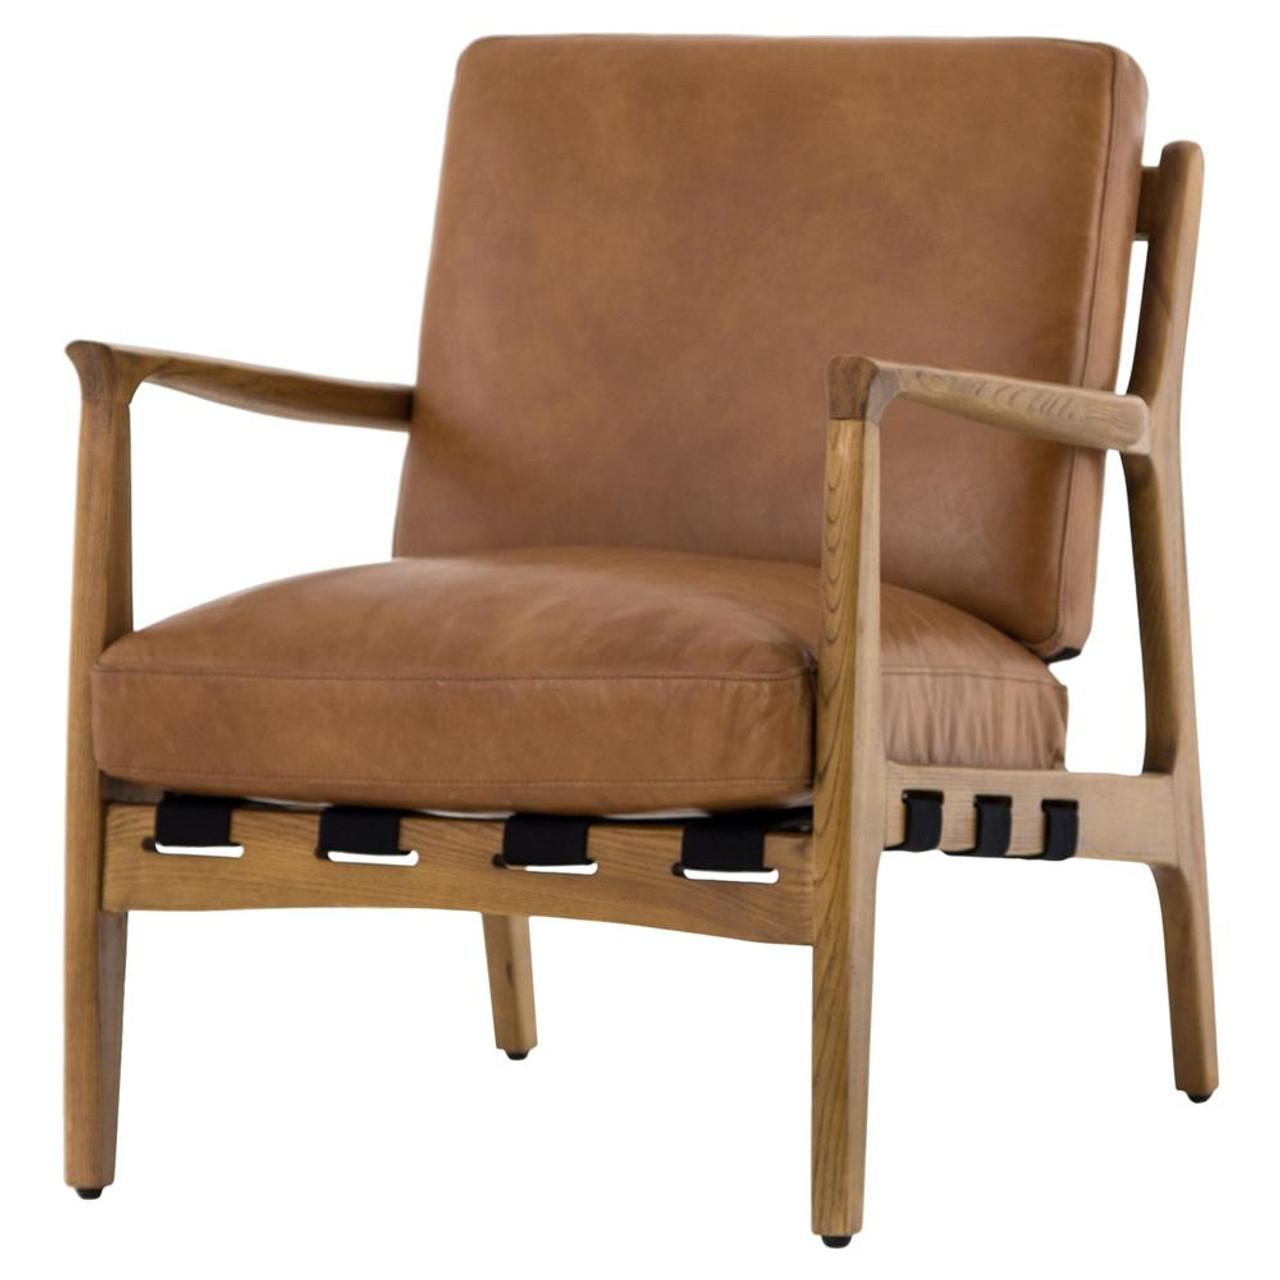 Best Mid Century Chair Wood